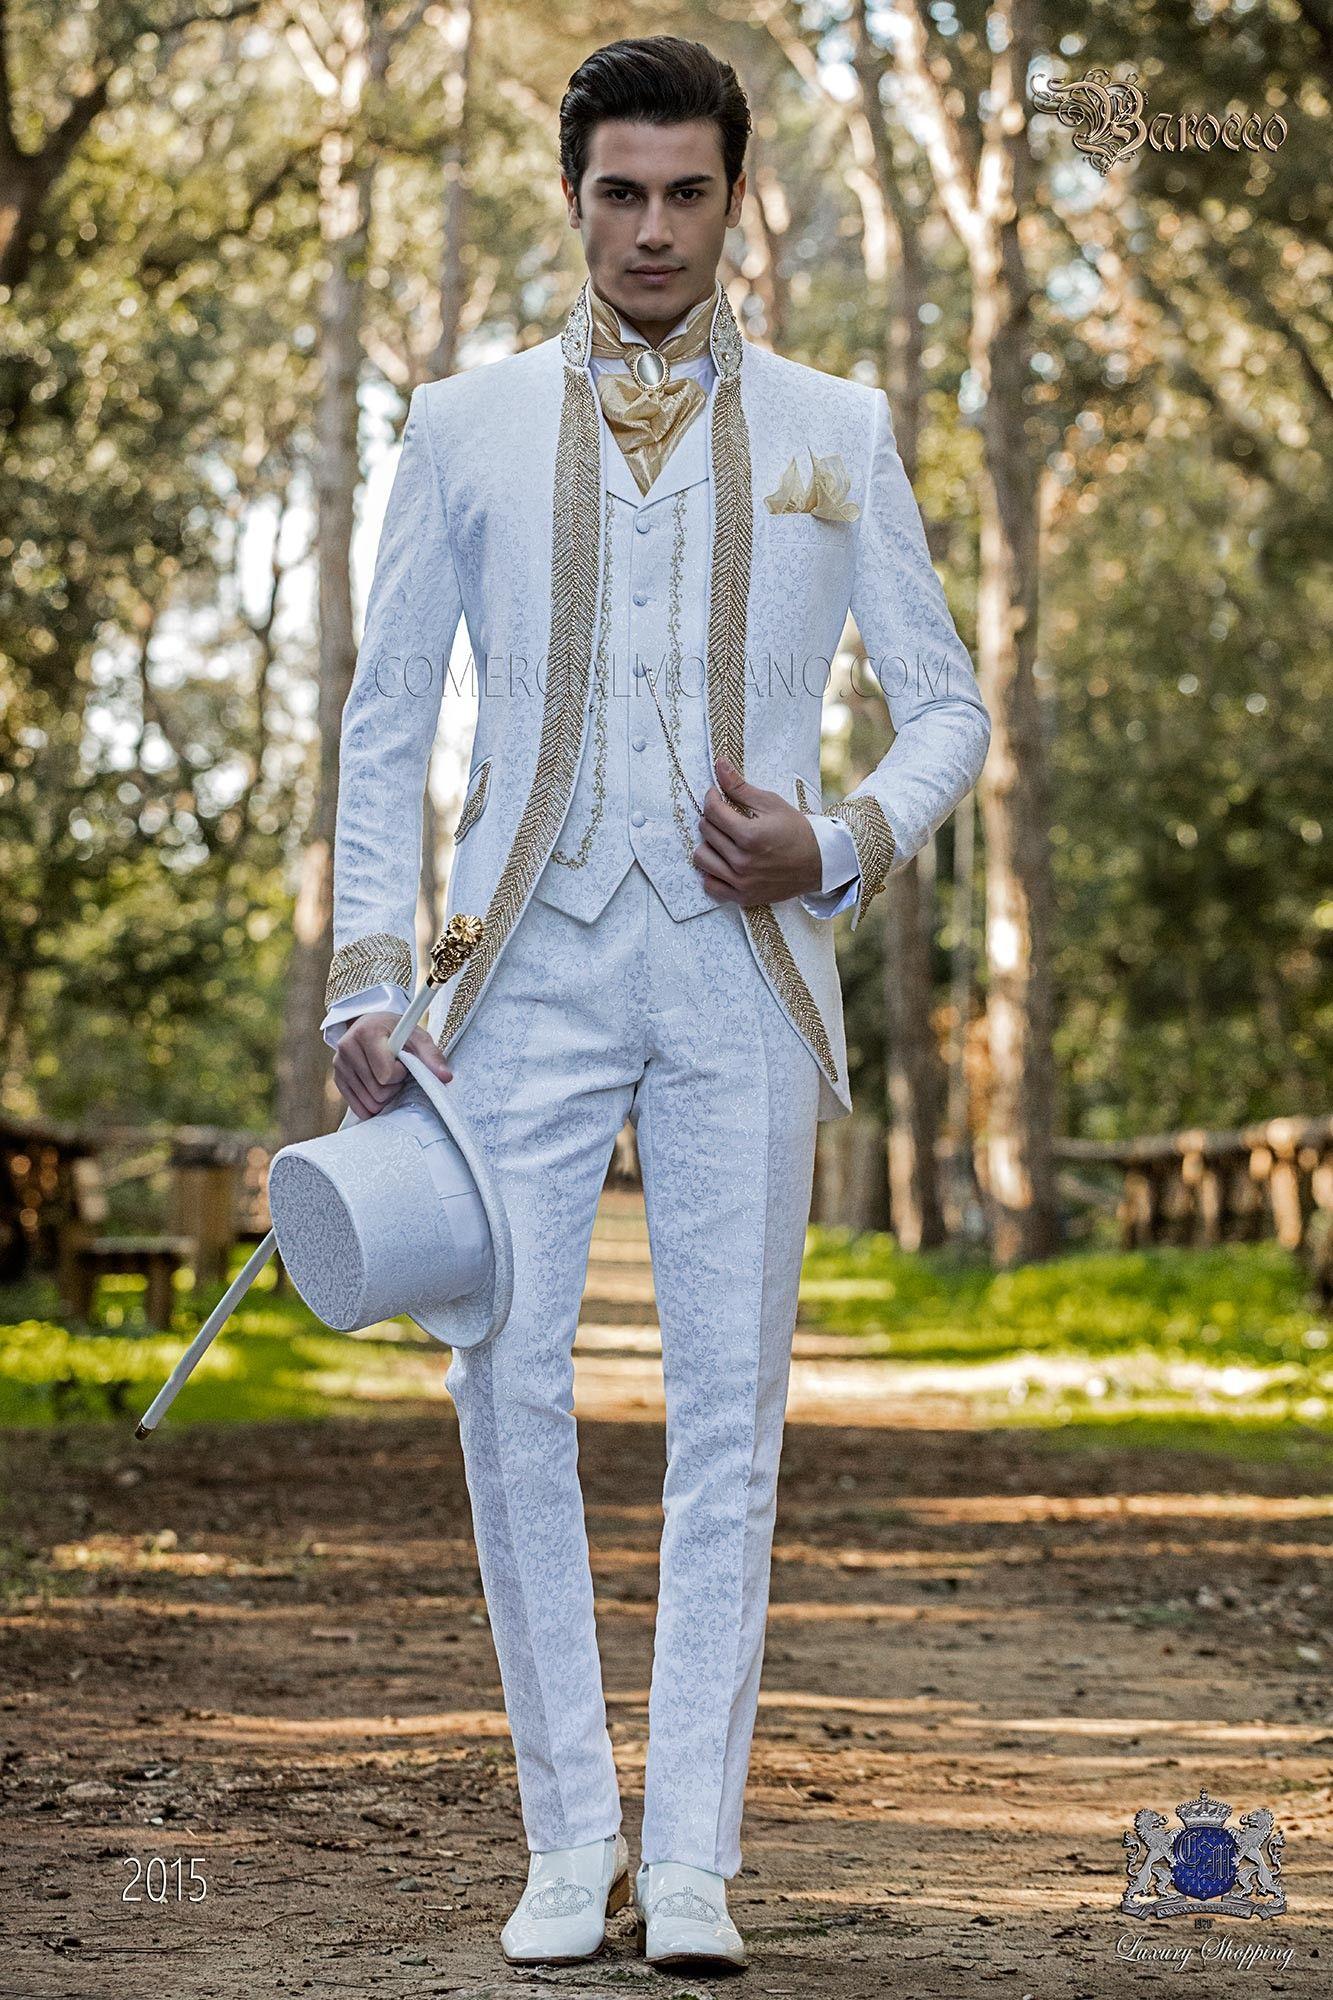 costume de mariage baroque redingote vintage en tissu de brocart floral blanc collier mao avec. Black Bedroom Furniture Sets. Home Design Ideas